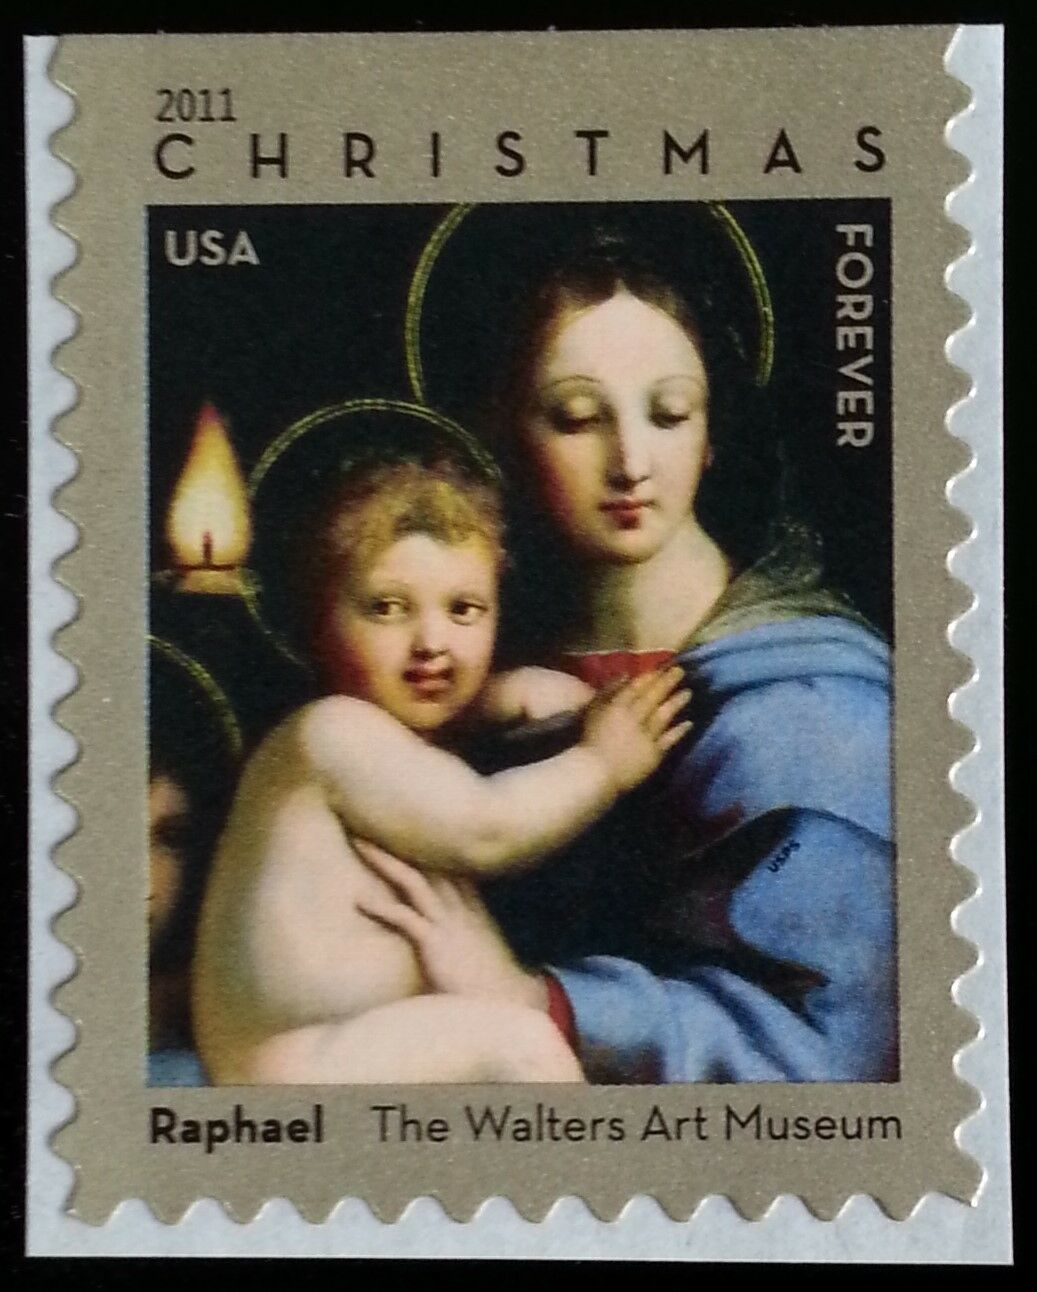 2011 44c Raphael Madonna & Child, Christmas Scott 4570